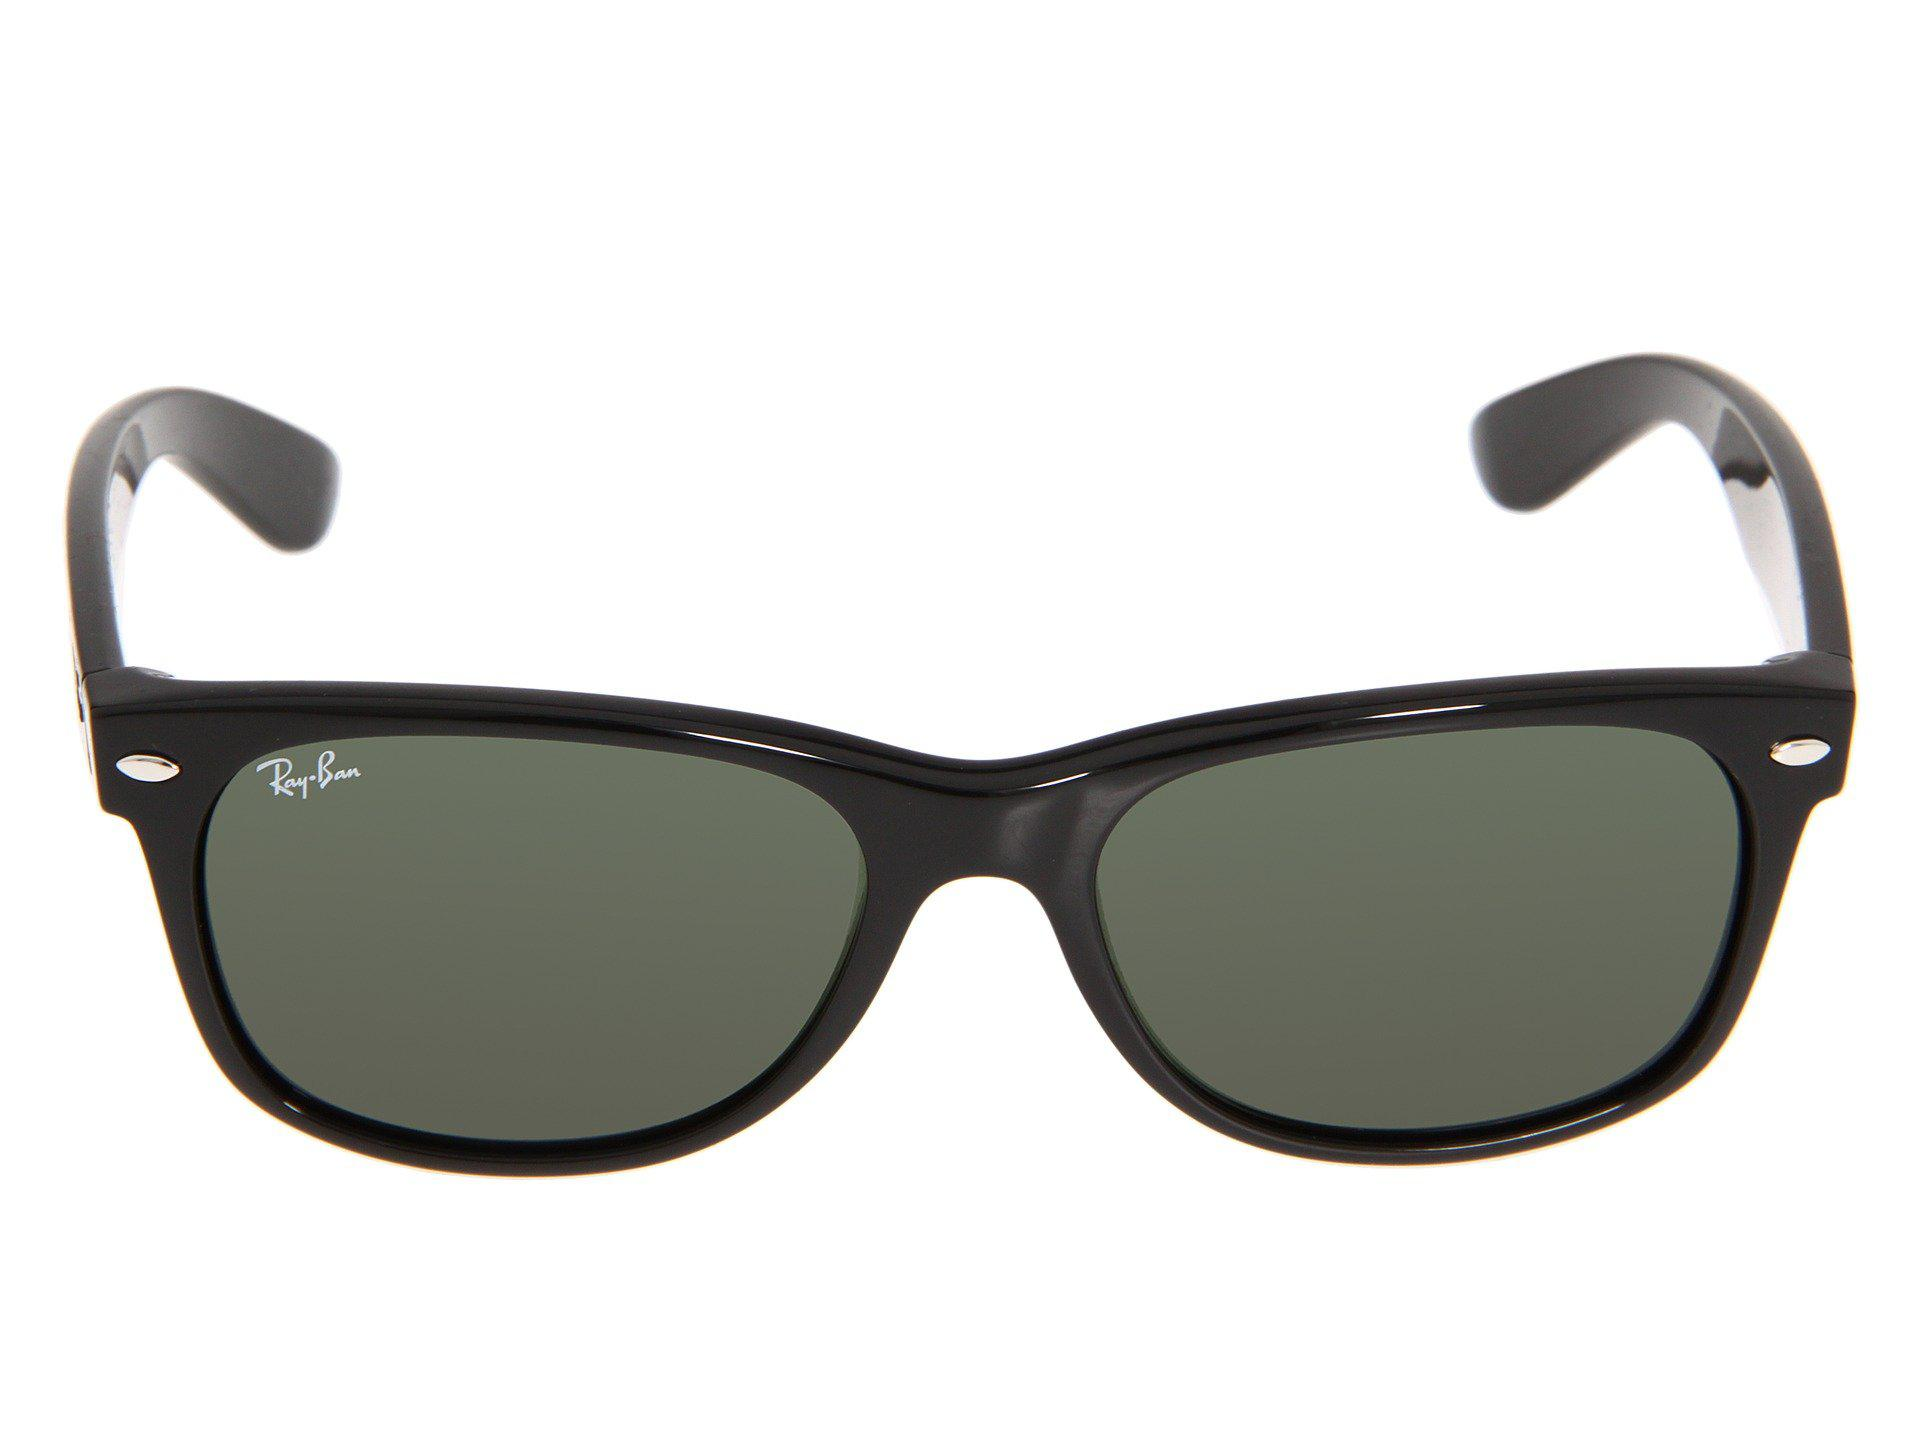 3c8c10a4c0 Lyst - Ray-Ban Rb2132 New Wayfarer 55mm (black g-15 Xlt Lens ...